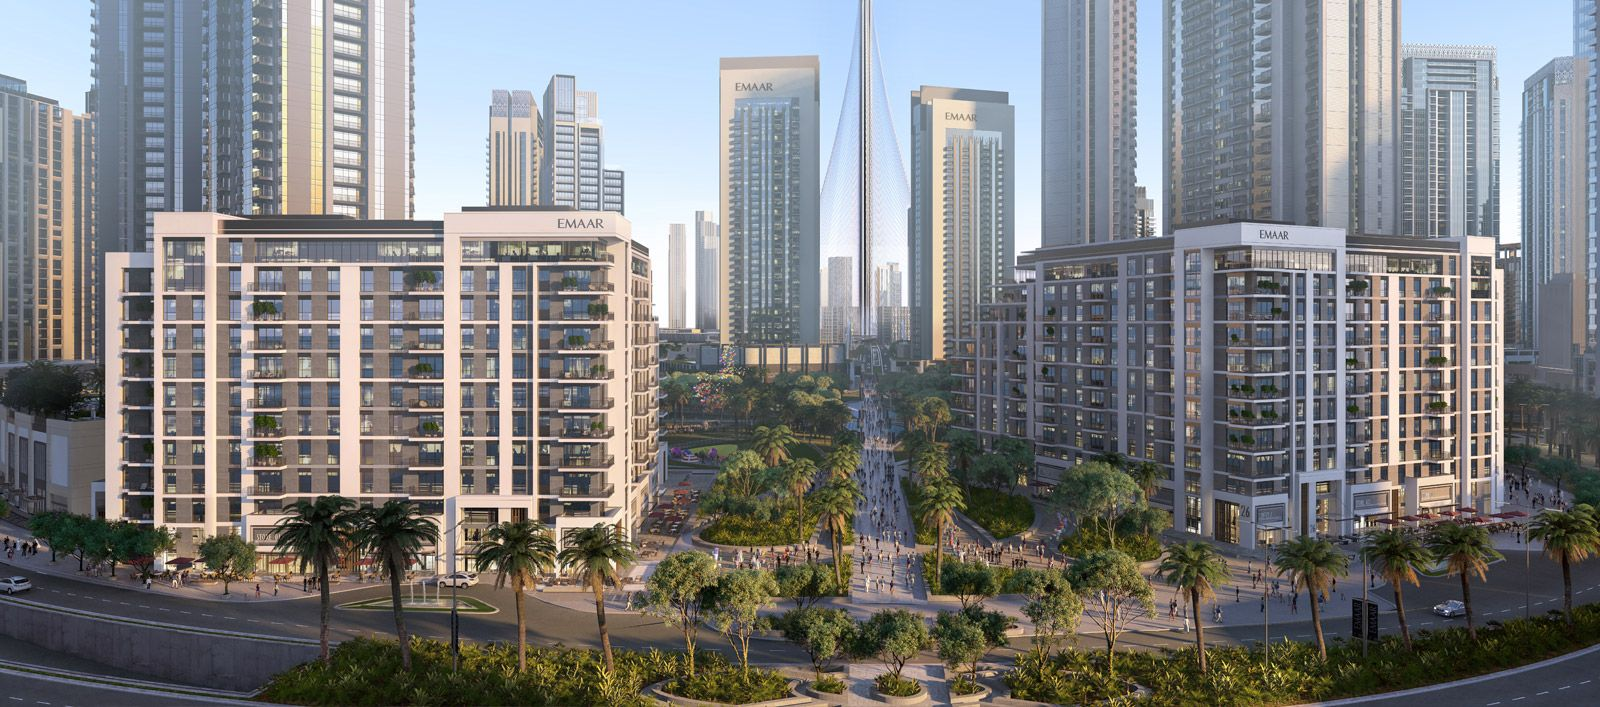 Island Park 1, Dubai Off Plan 1,2,3 Bedroom Apartment